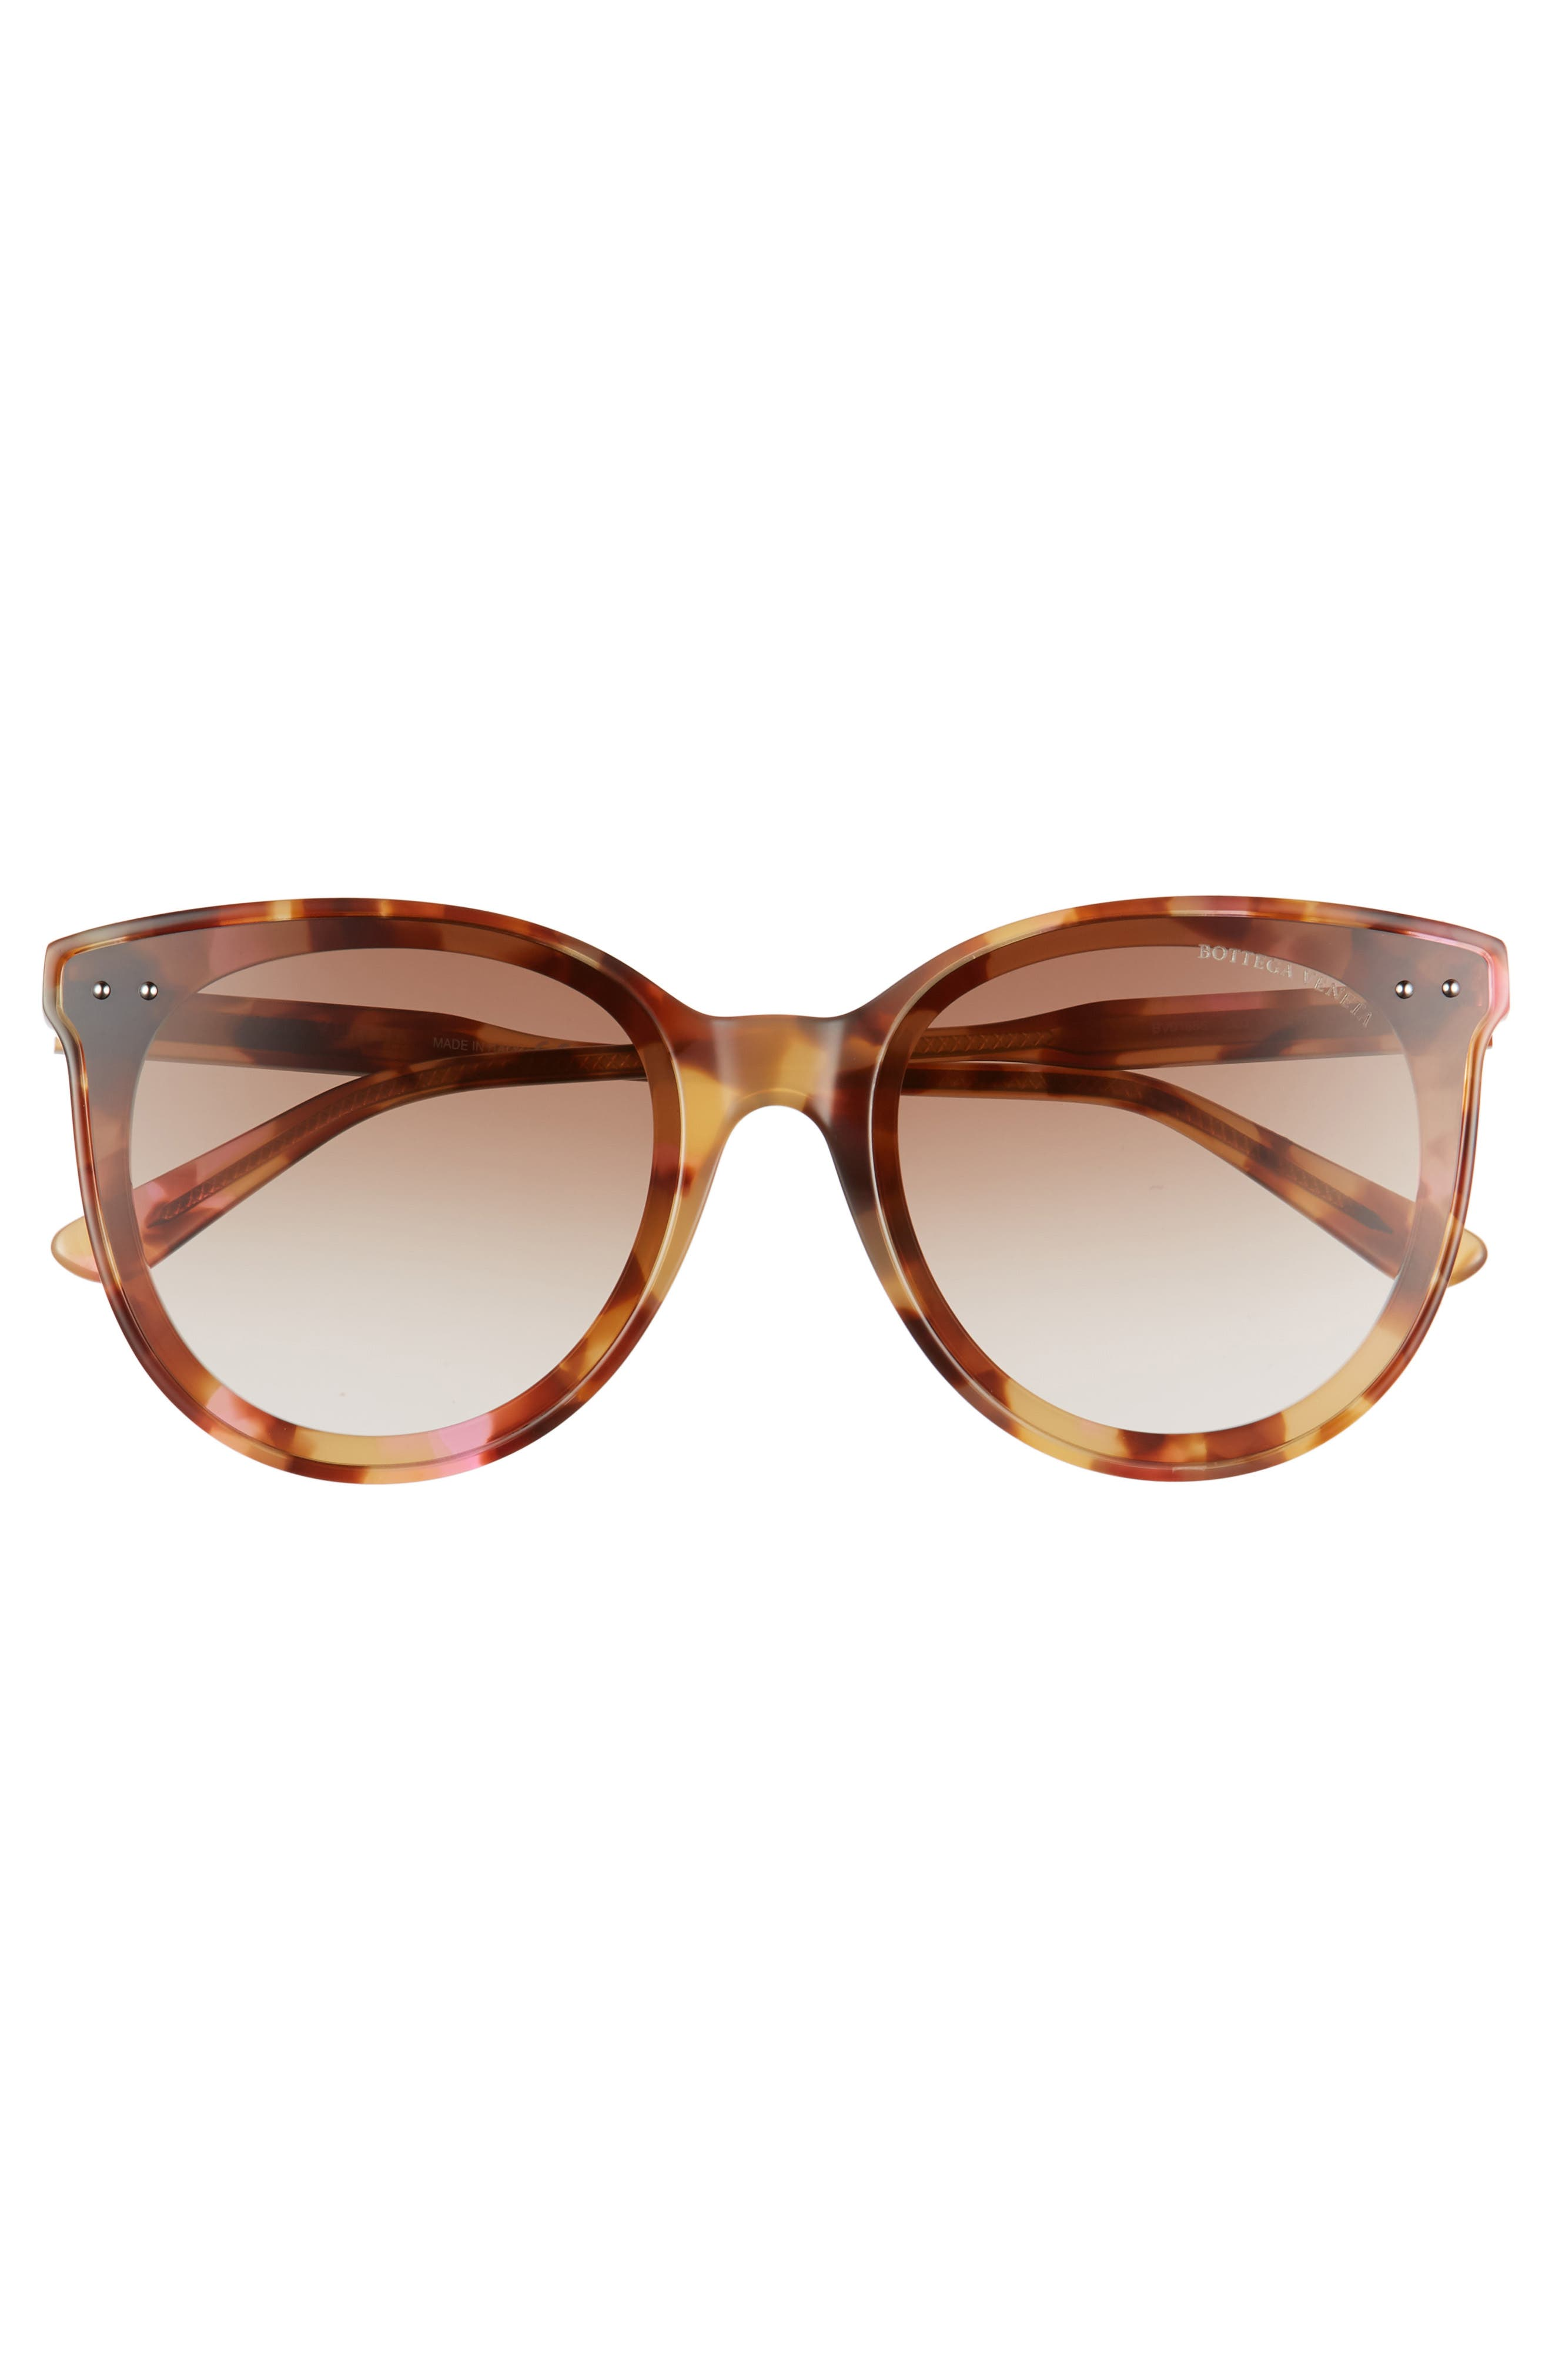 61mm Cat Eye Sunglasses,                             Alternate thumbnail 3, color,                             PINK HAVANA